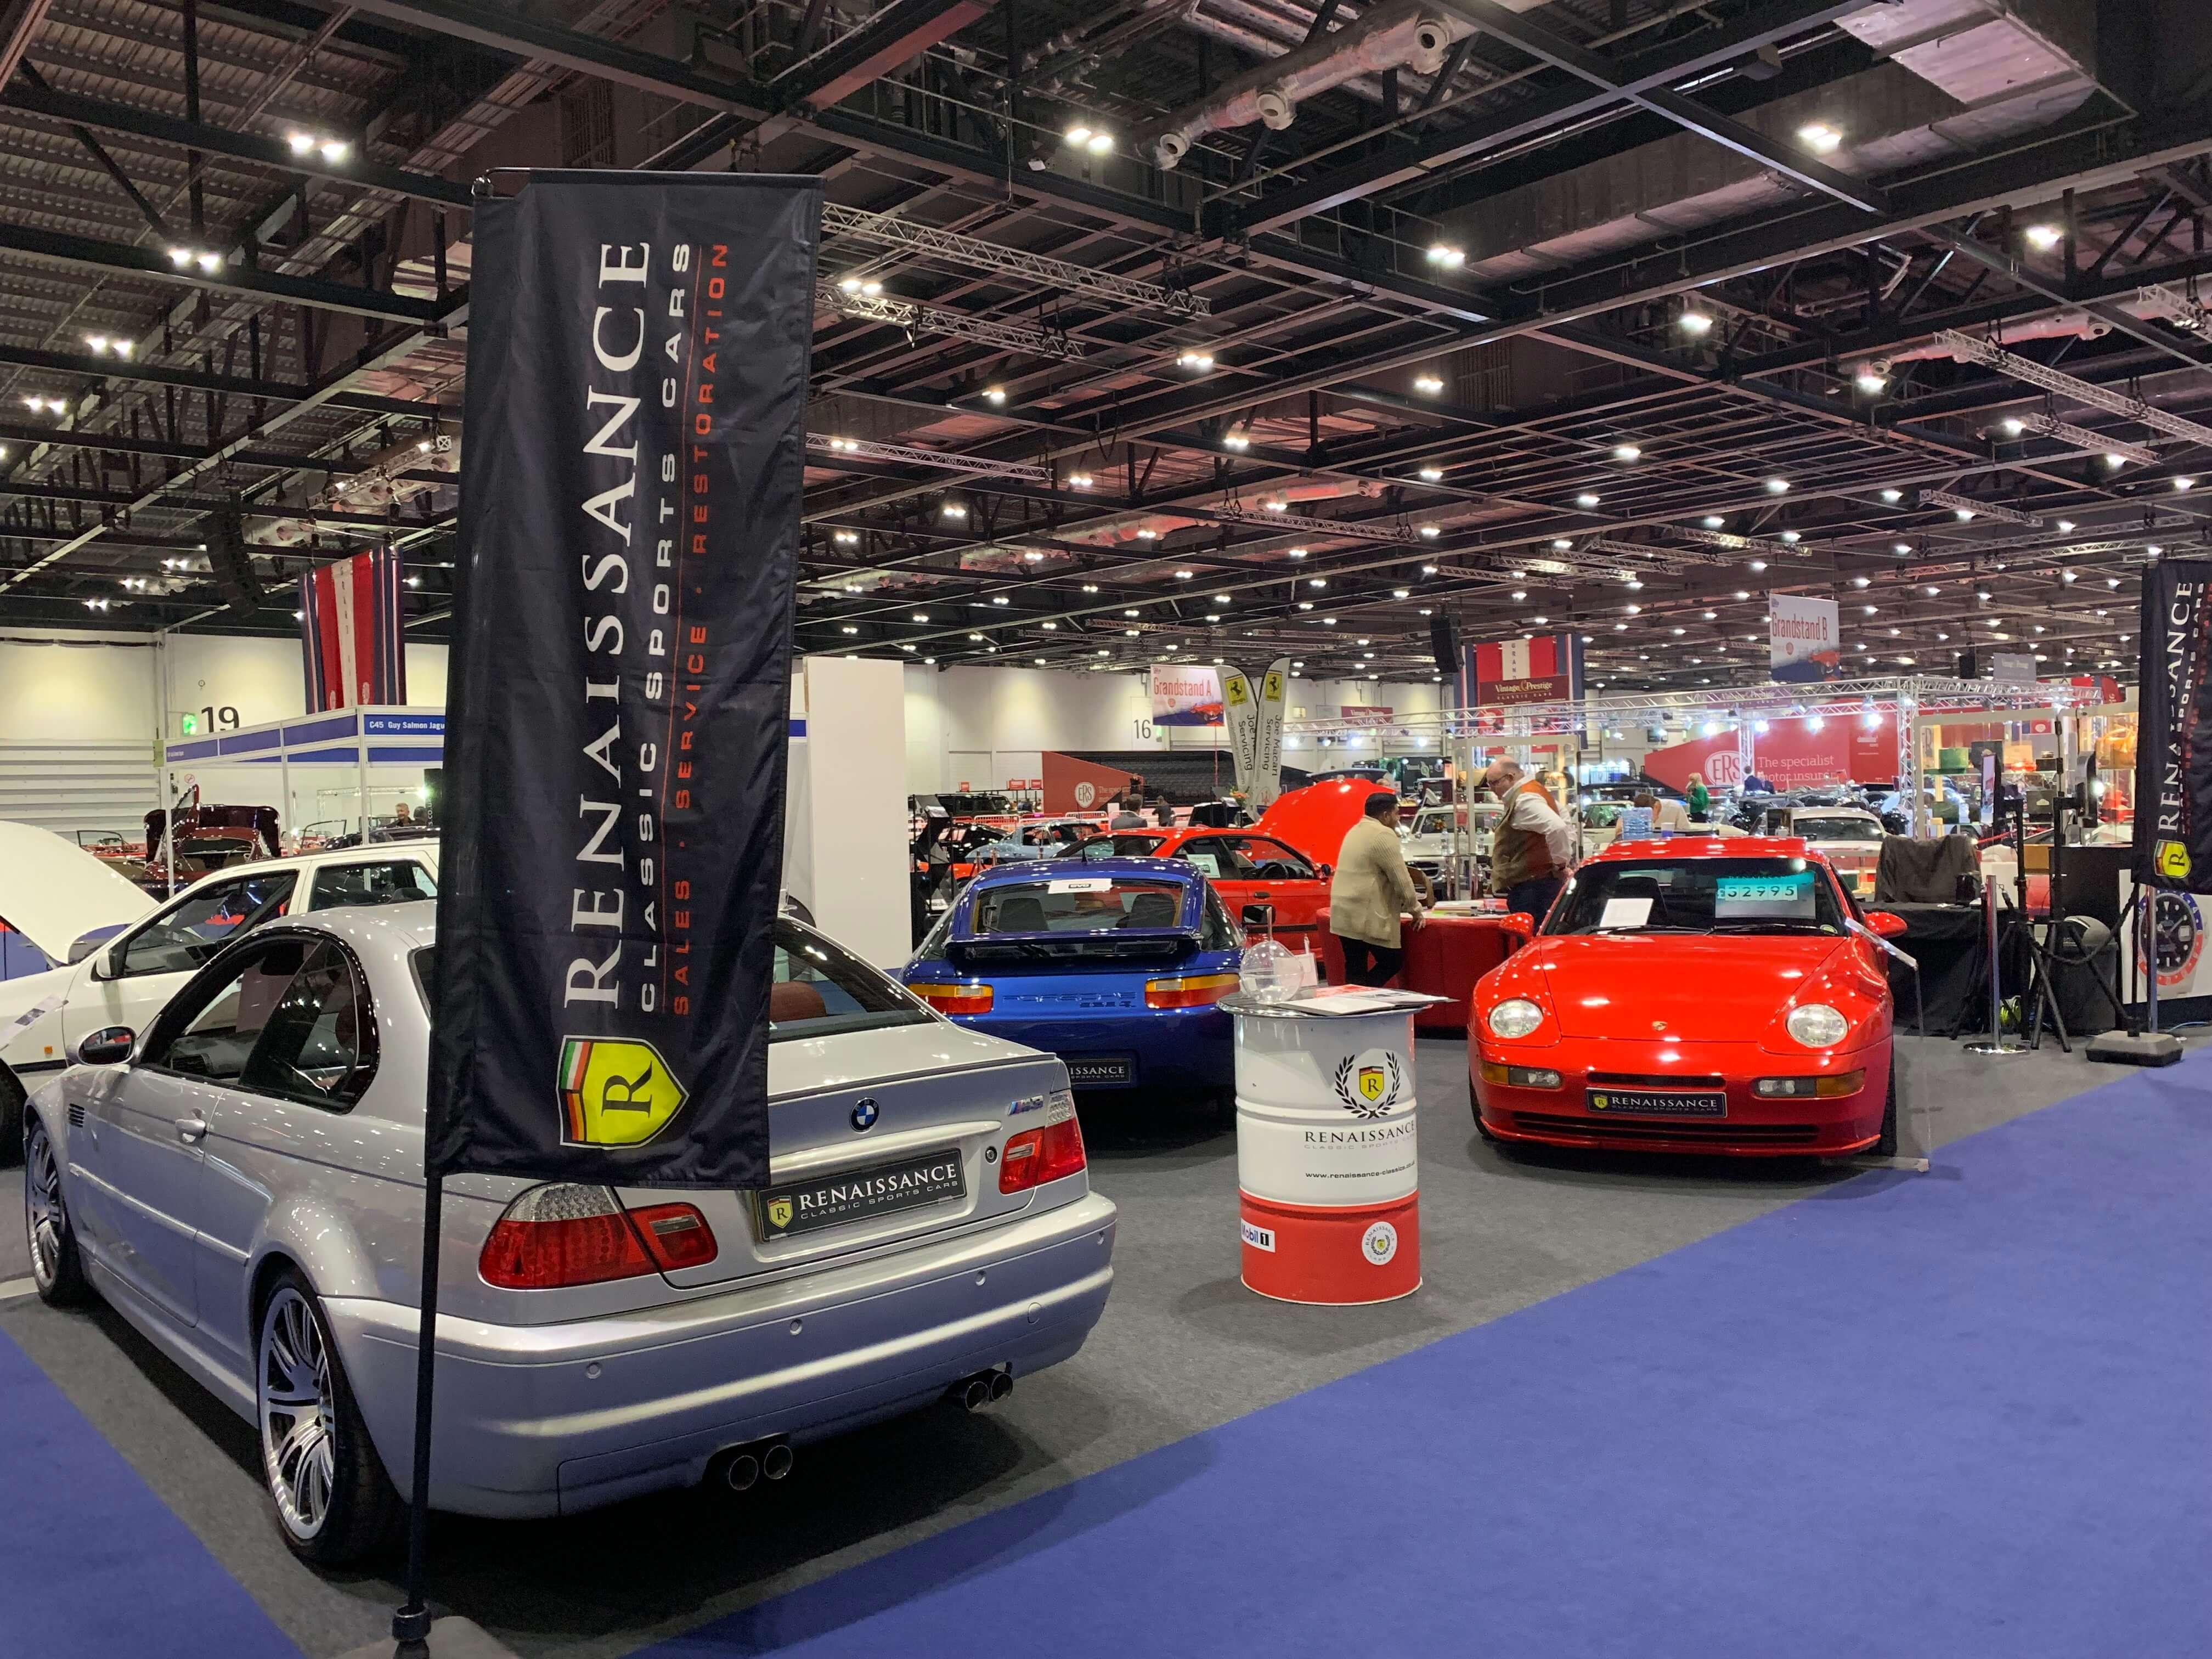 THE LONDON CLASSIC CAR SHOW 2019